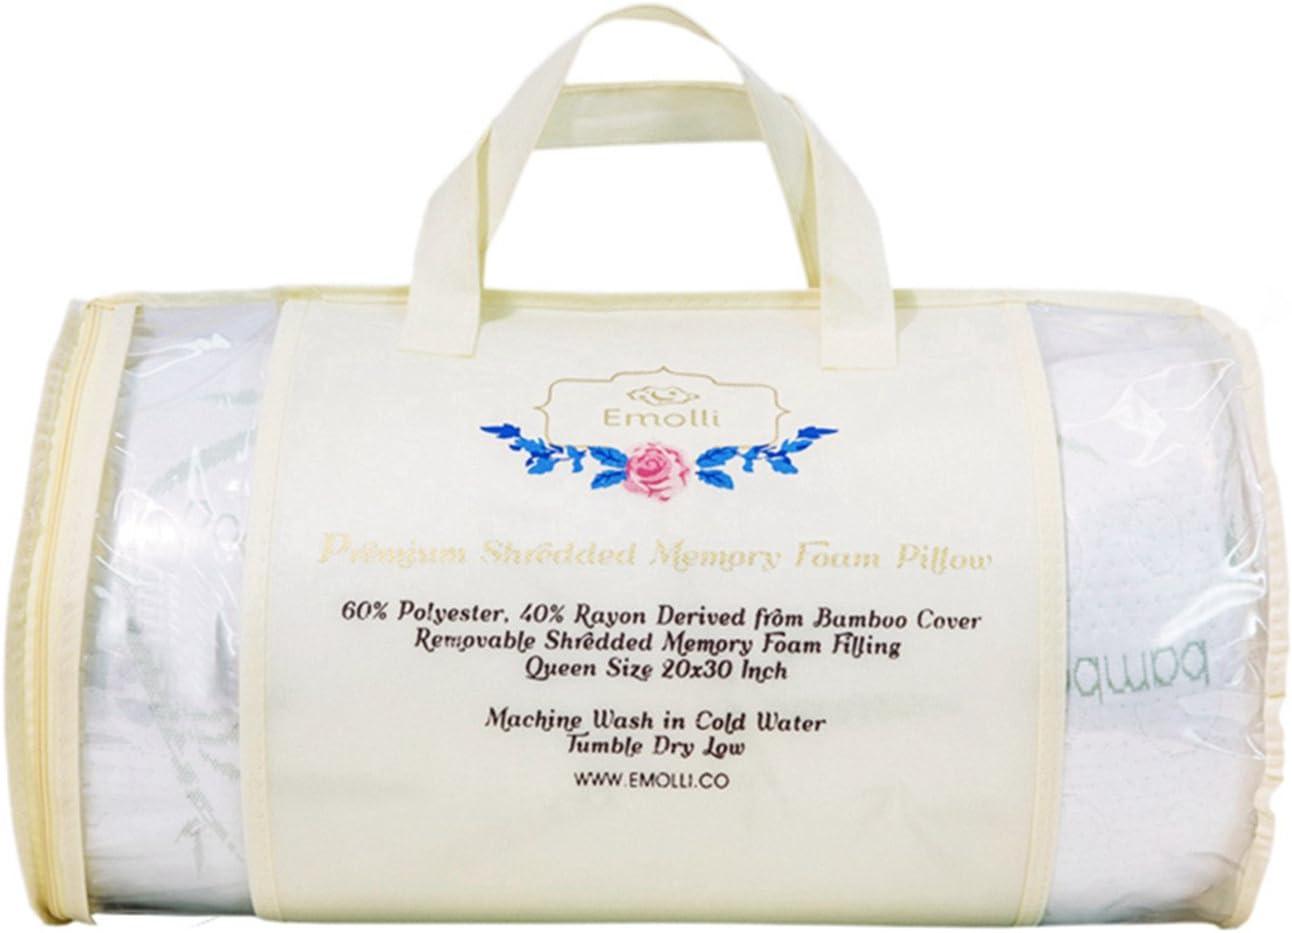 Emolli Shredded Memory Foam Pillow